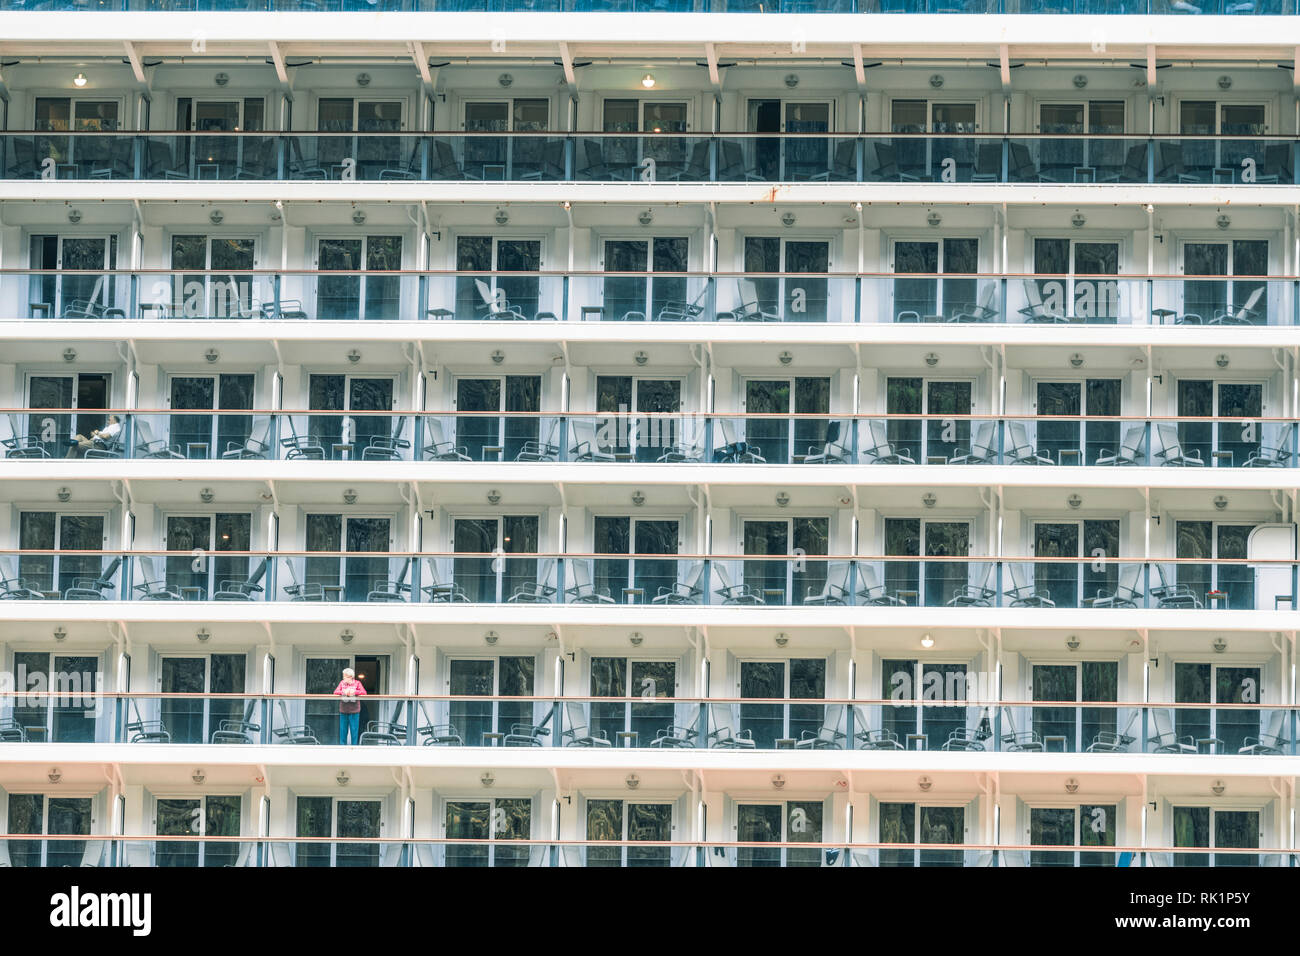 Detail of portholes on multistory cruise ship, full frame - Stock Image